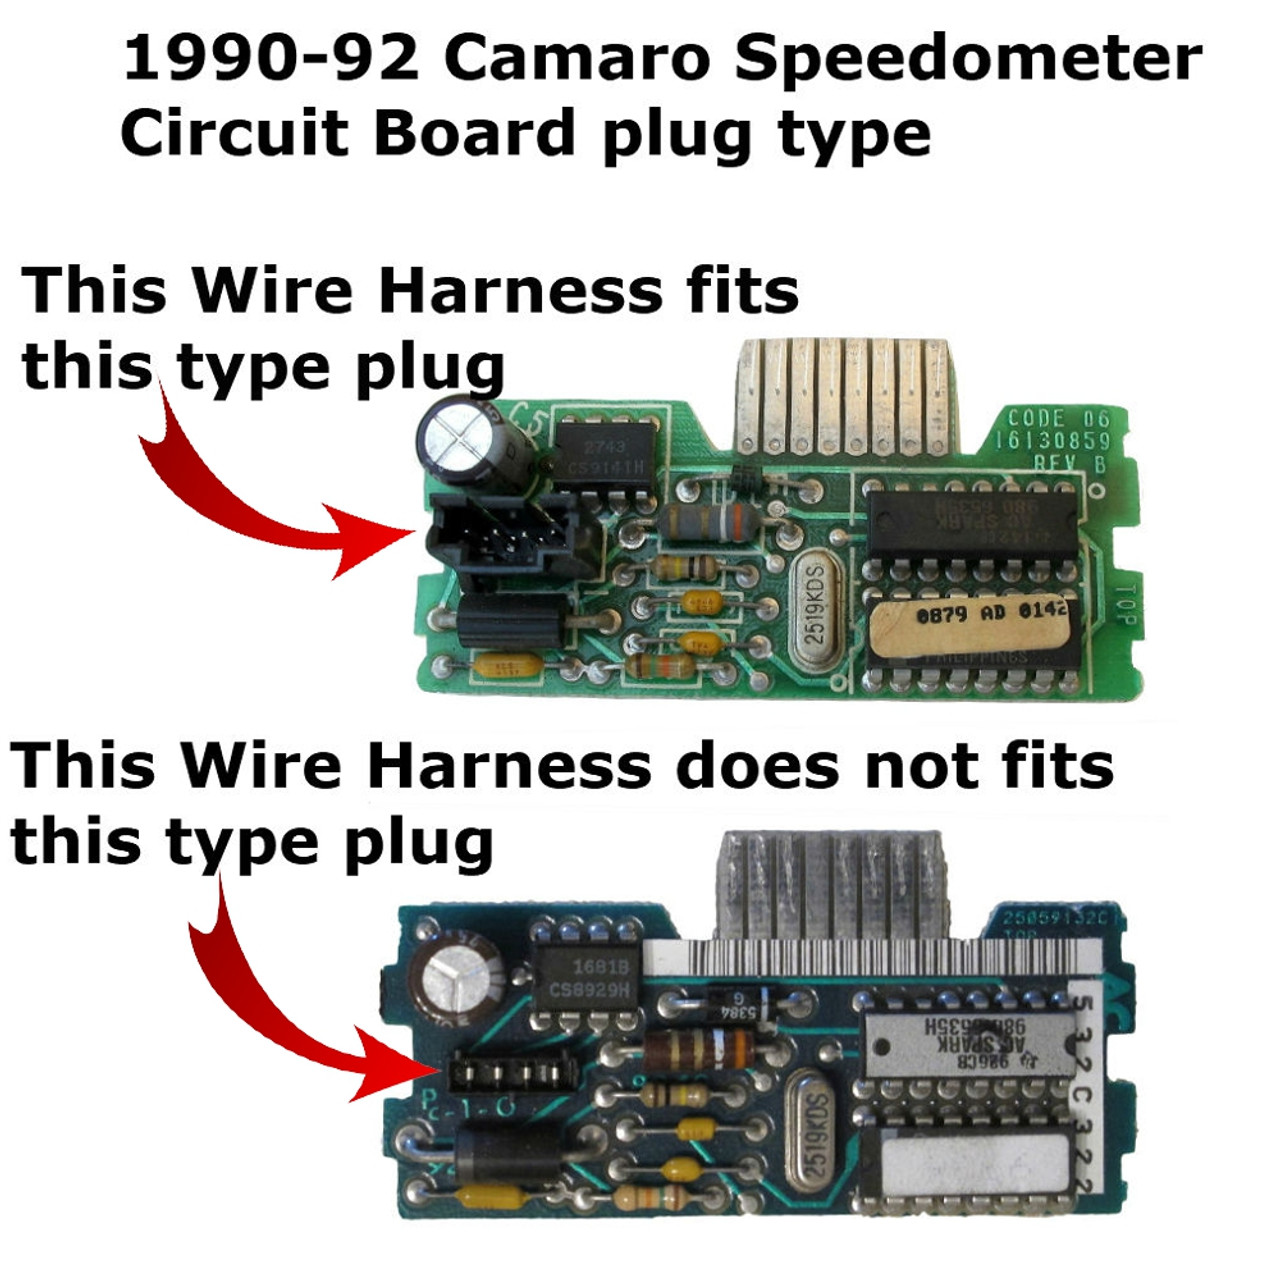 hight resolution of 1990 92 chevy camaro speedometer wire harness plug type 2 1990 92 chevy camaro speedometer